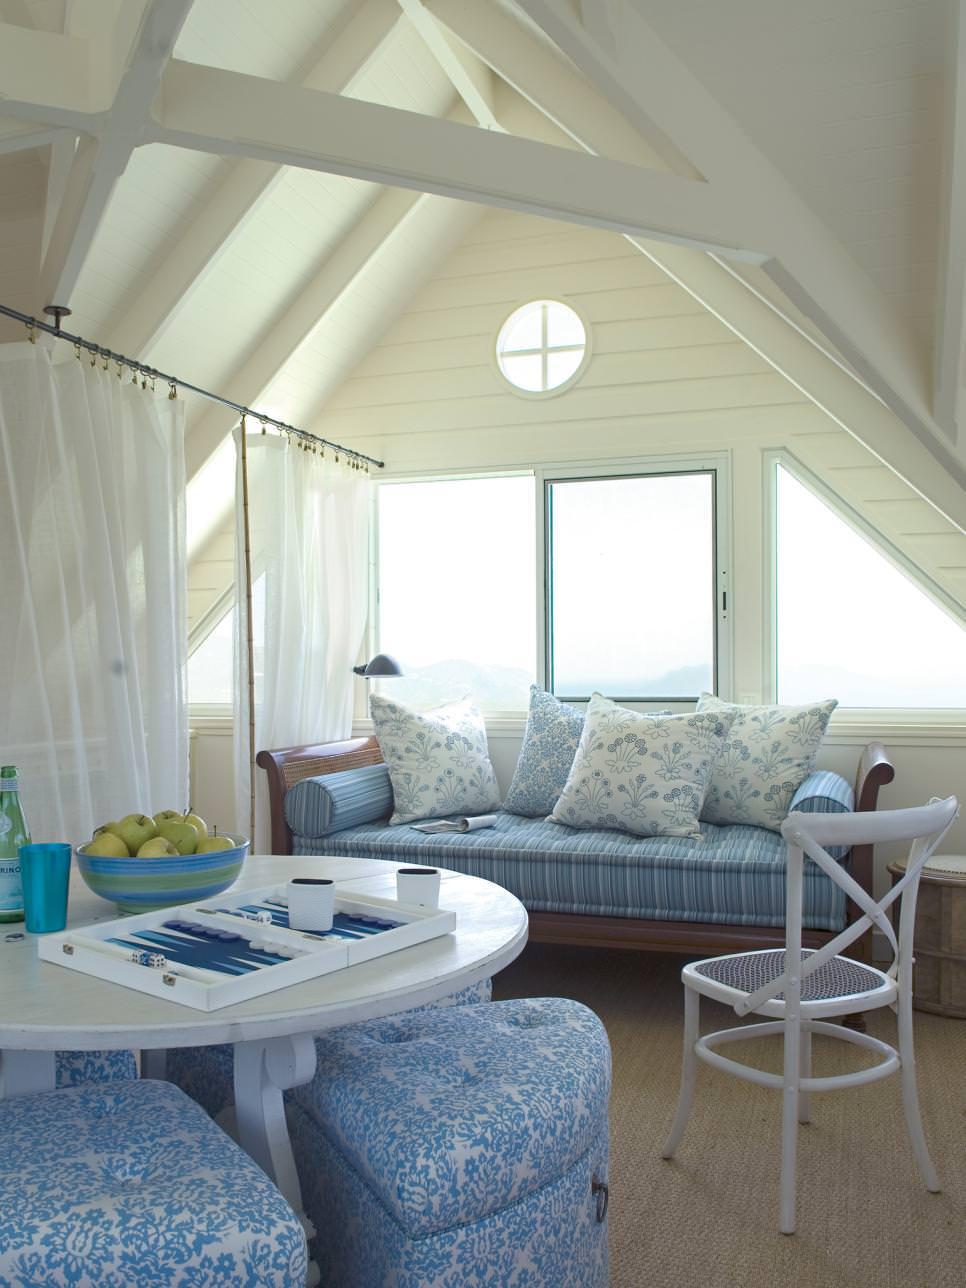 23 Decorated Attic Home Designs Decorating Ideas  Design Trends  Premium PSD Vector Downloads